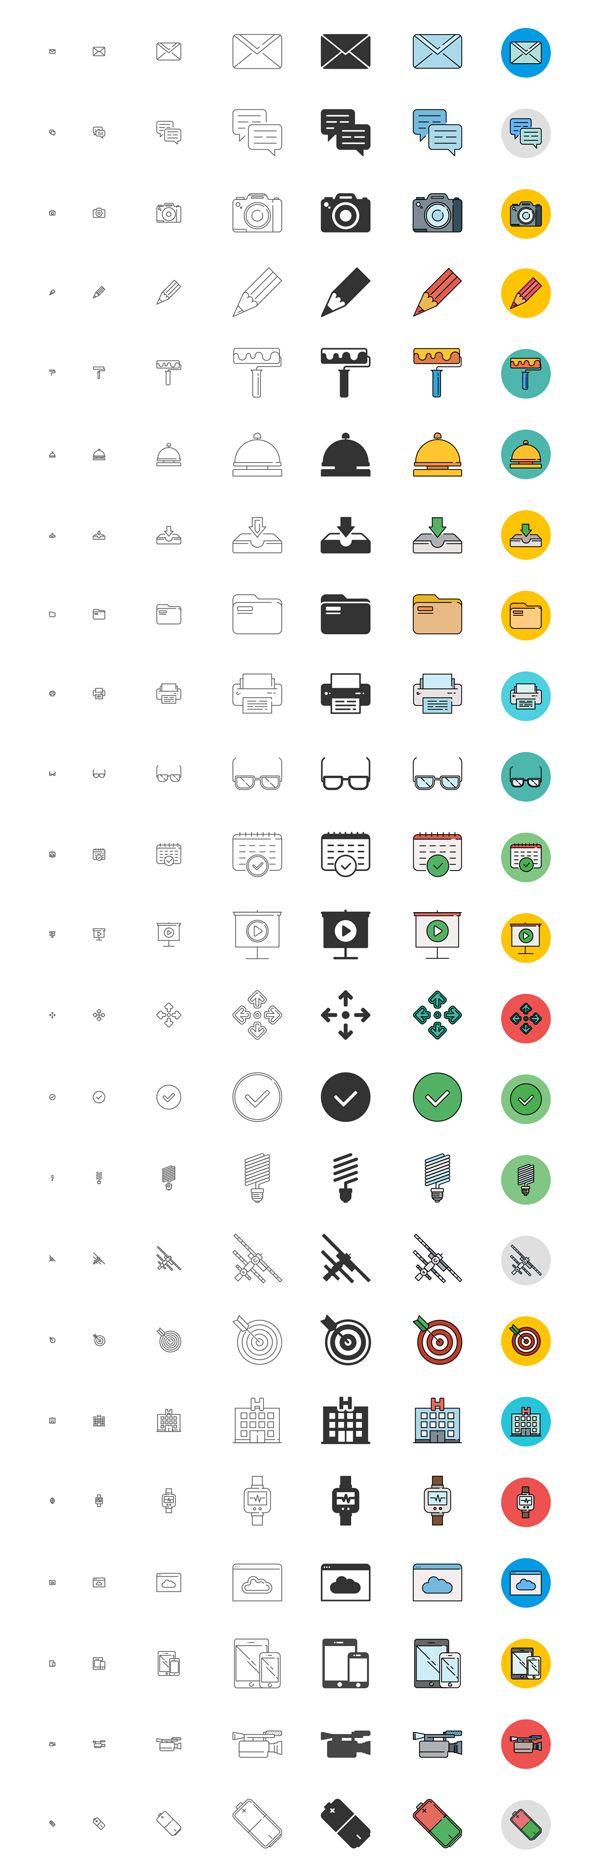 Gratis responsieve icoontjes sets - https://www.mediaostrich.nl/overige-services